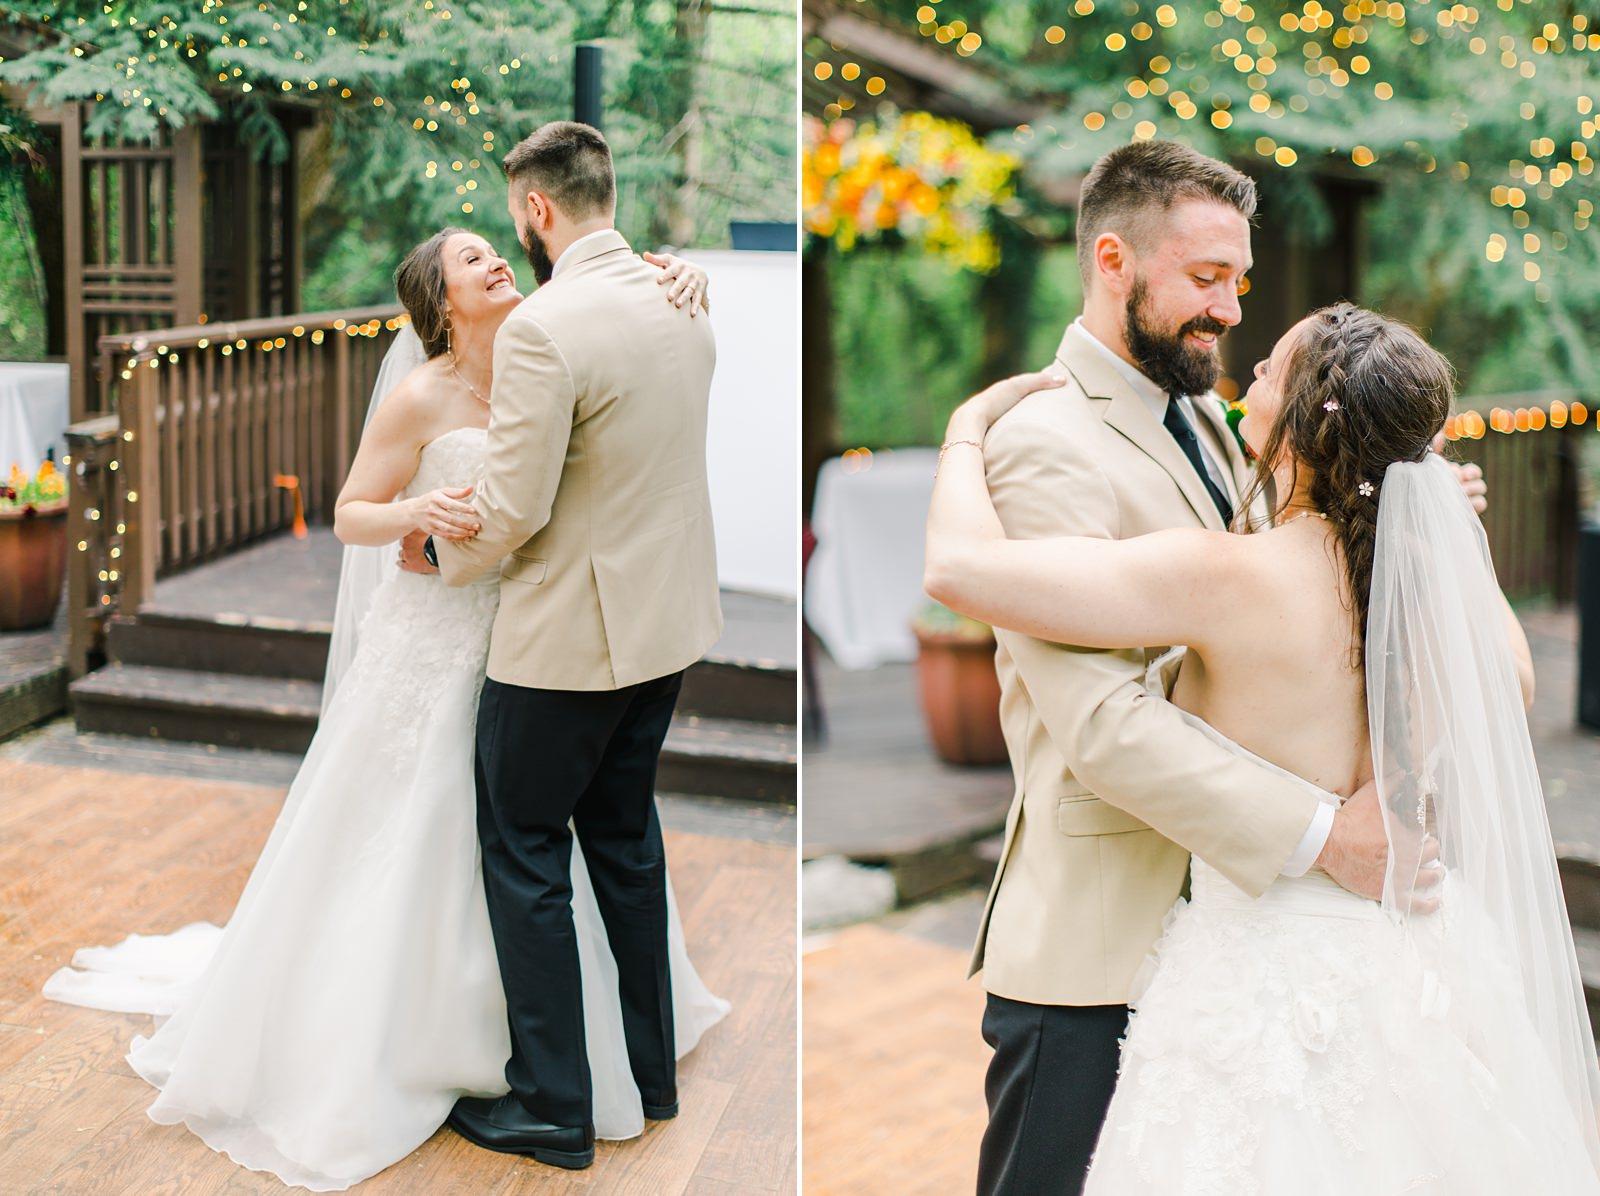 Millcreek Inn Summer Wedding, Utah wedding photography Millcreek Canyon, Salt Lake City, bride and groom first dance